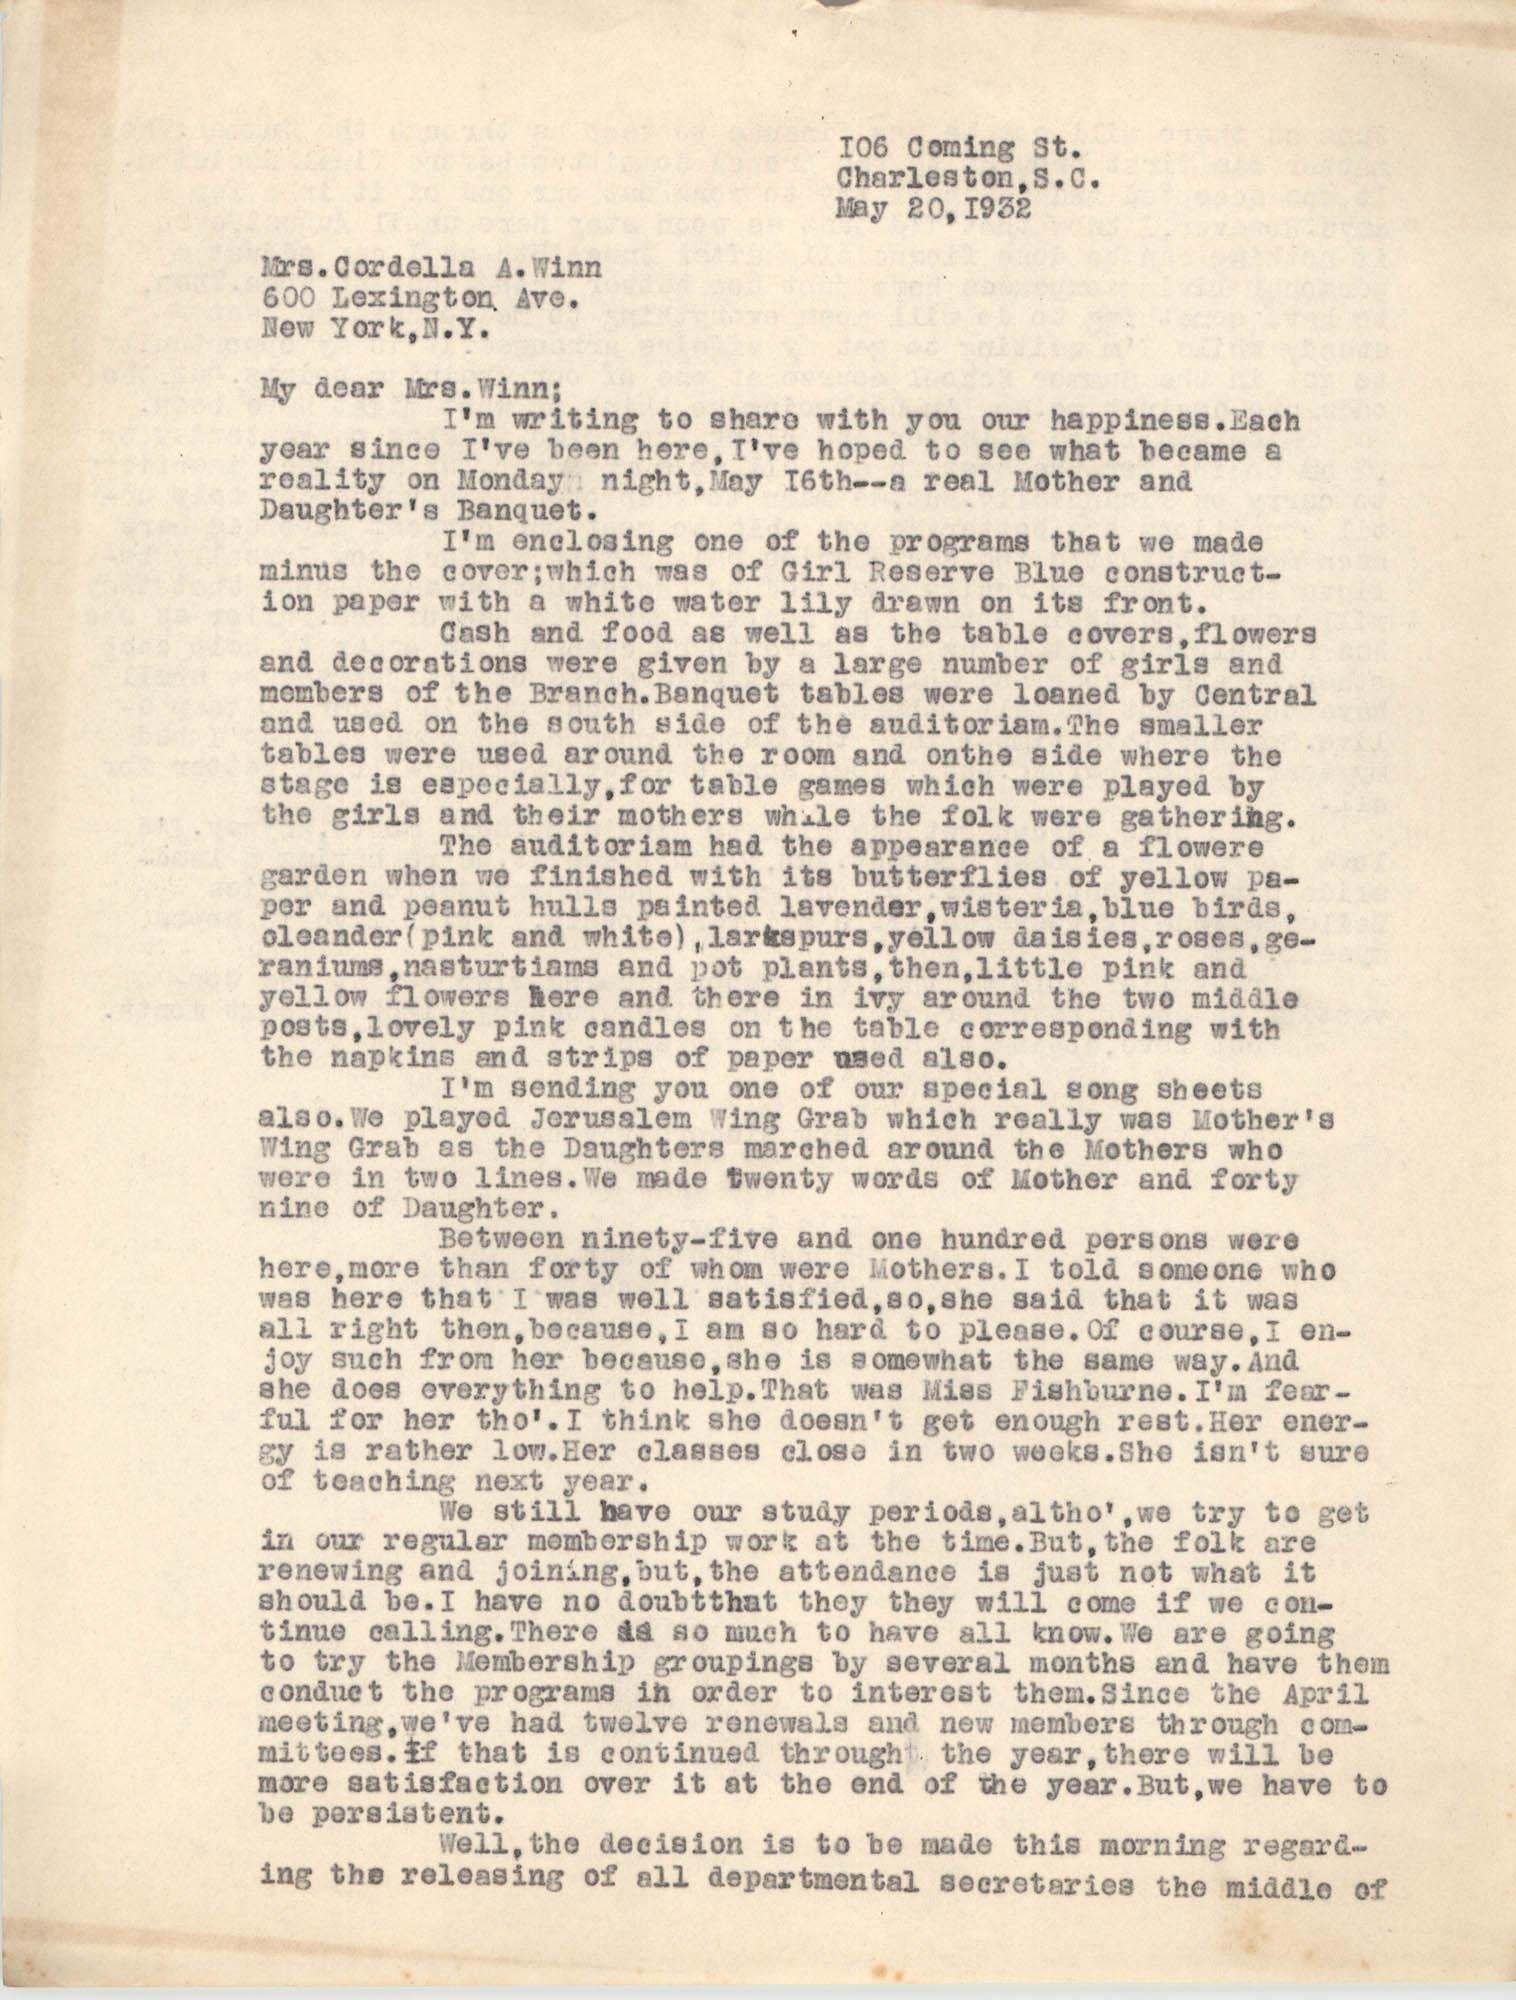 Letter from Ella L. Smyrl to Cordella A. Winn, May 20, 1932